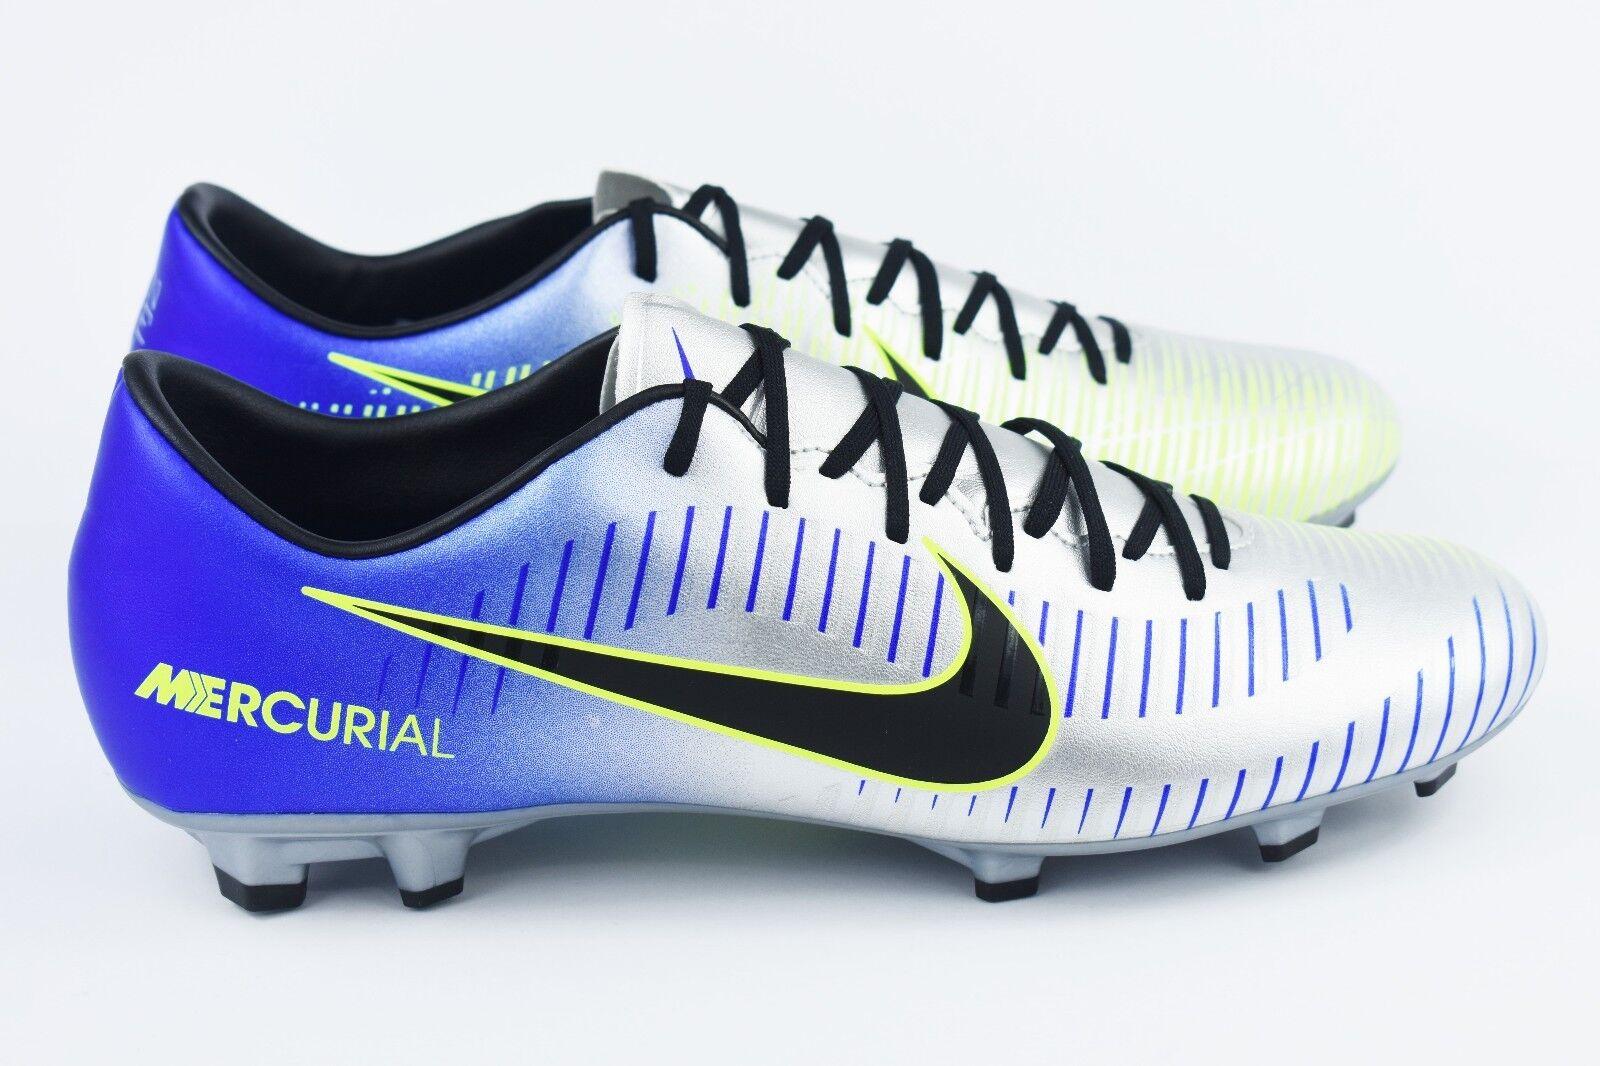 Nike mercurial sieg - größe vi njr fg - mens größe - 10 soccer cleats neymar 921509 407 da3681